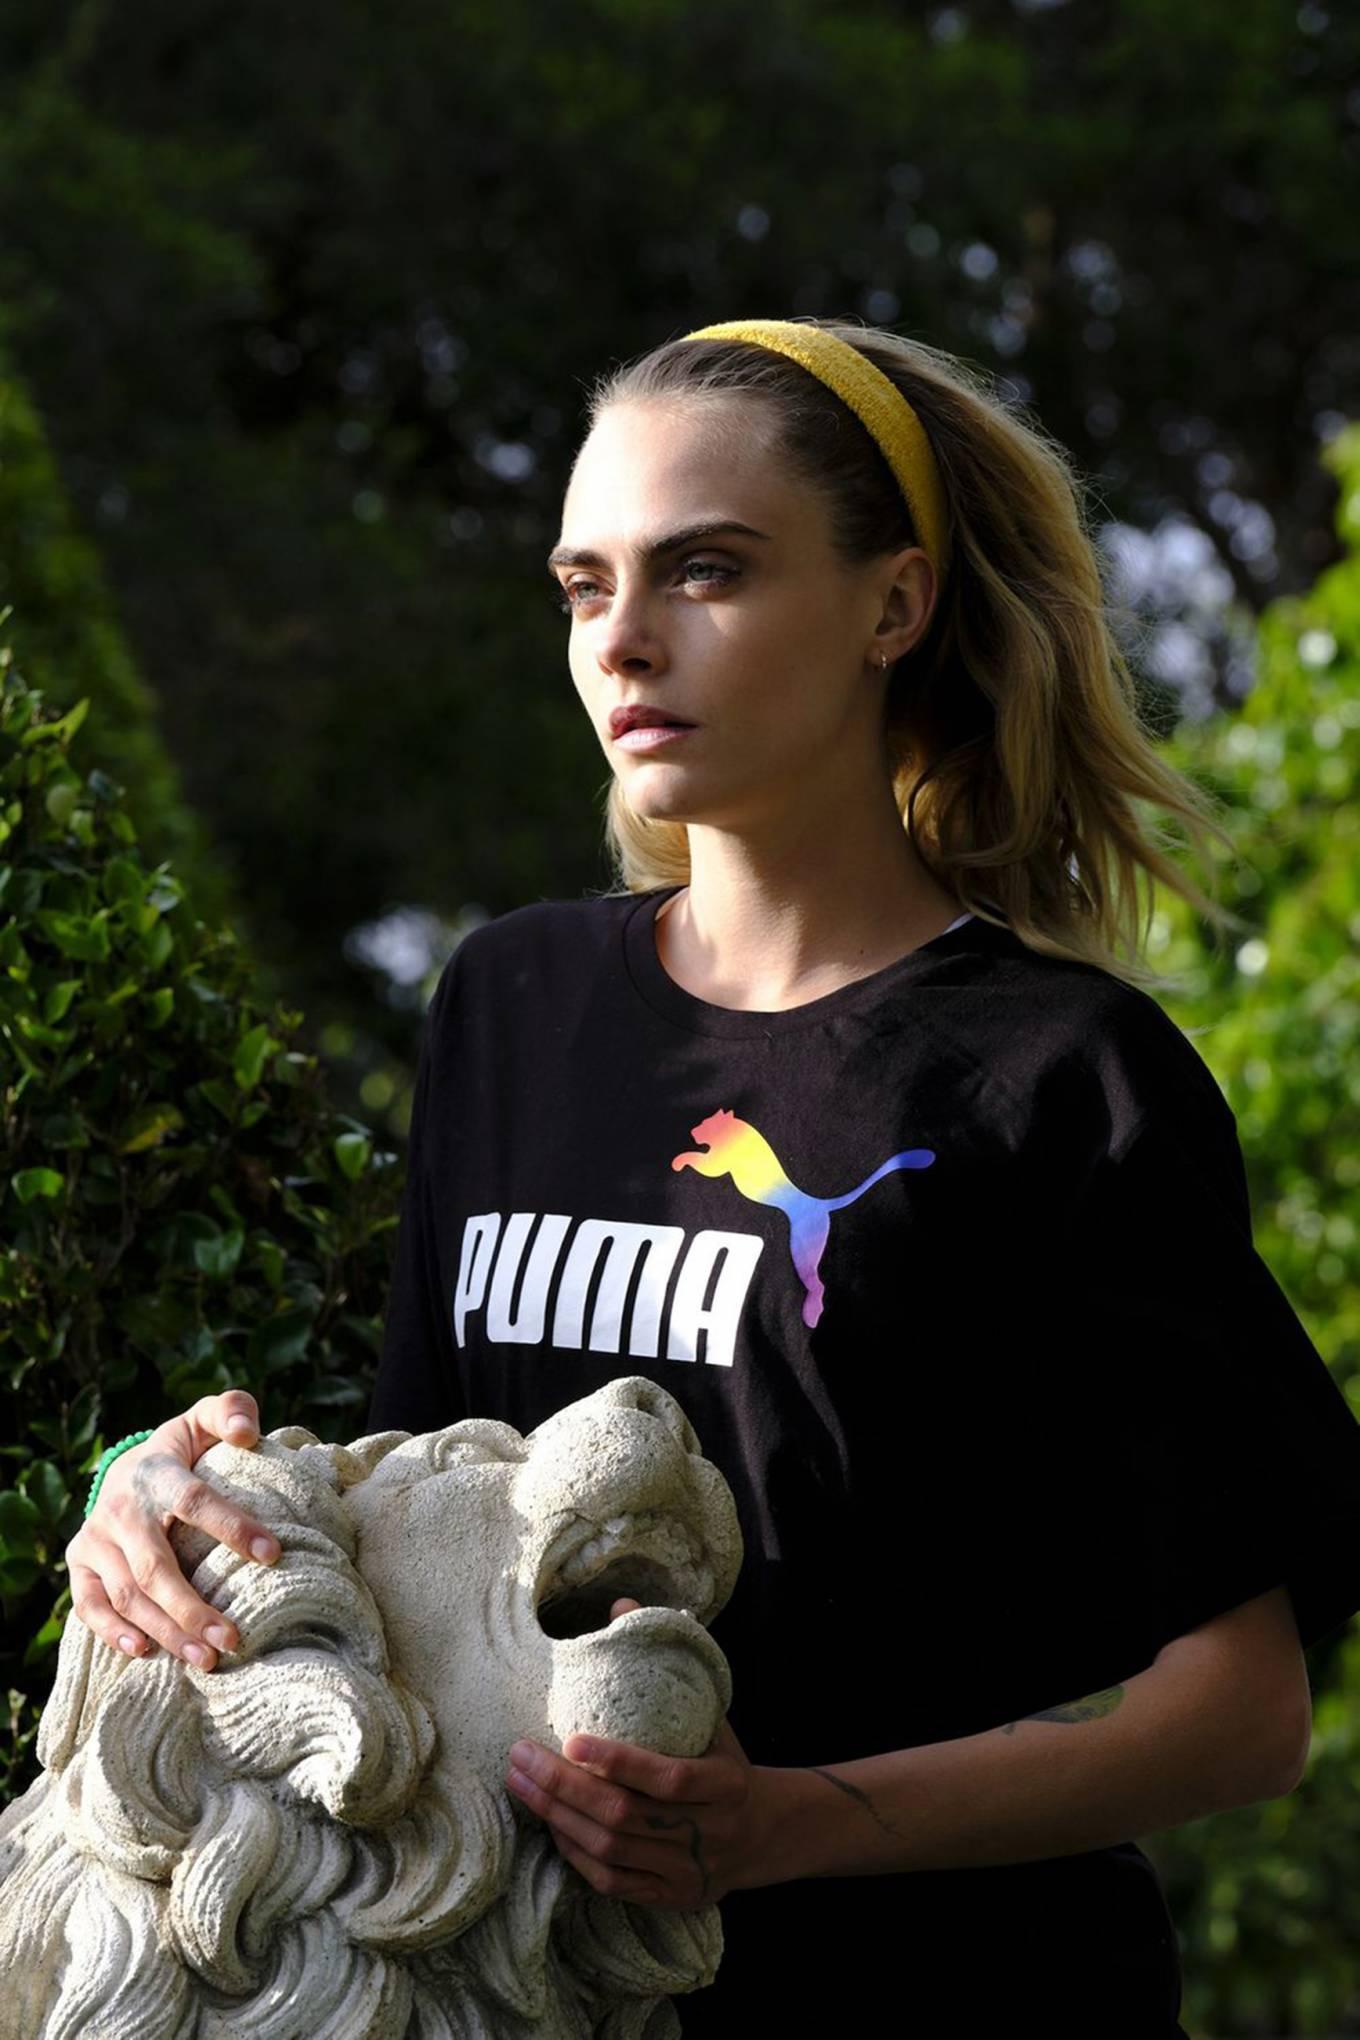 Cara Delevingne 2020 : Cara Delevingne – Photoshoot for PUMA Campaign 2020-02